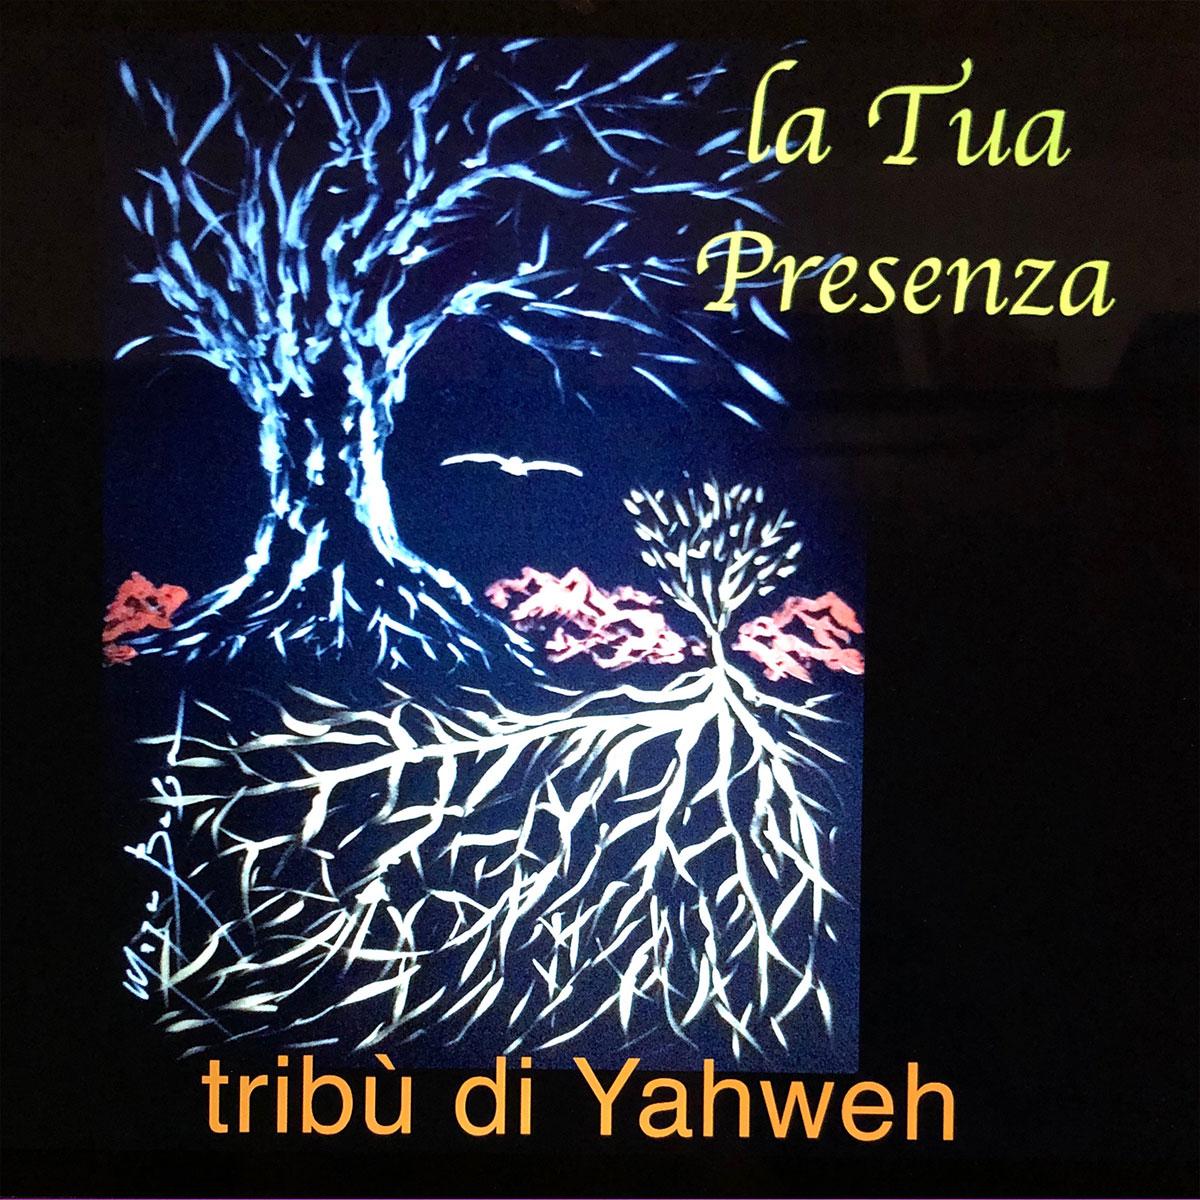 http://www.tribudiyahweh.com/wp/wp-content/uploads/2019/02/la-tua-presenza.jpg